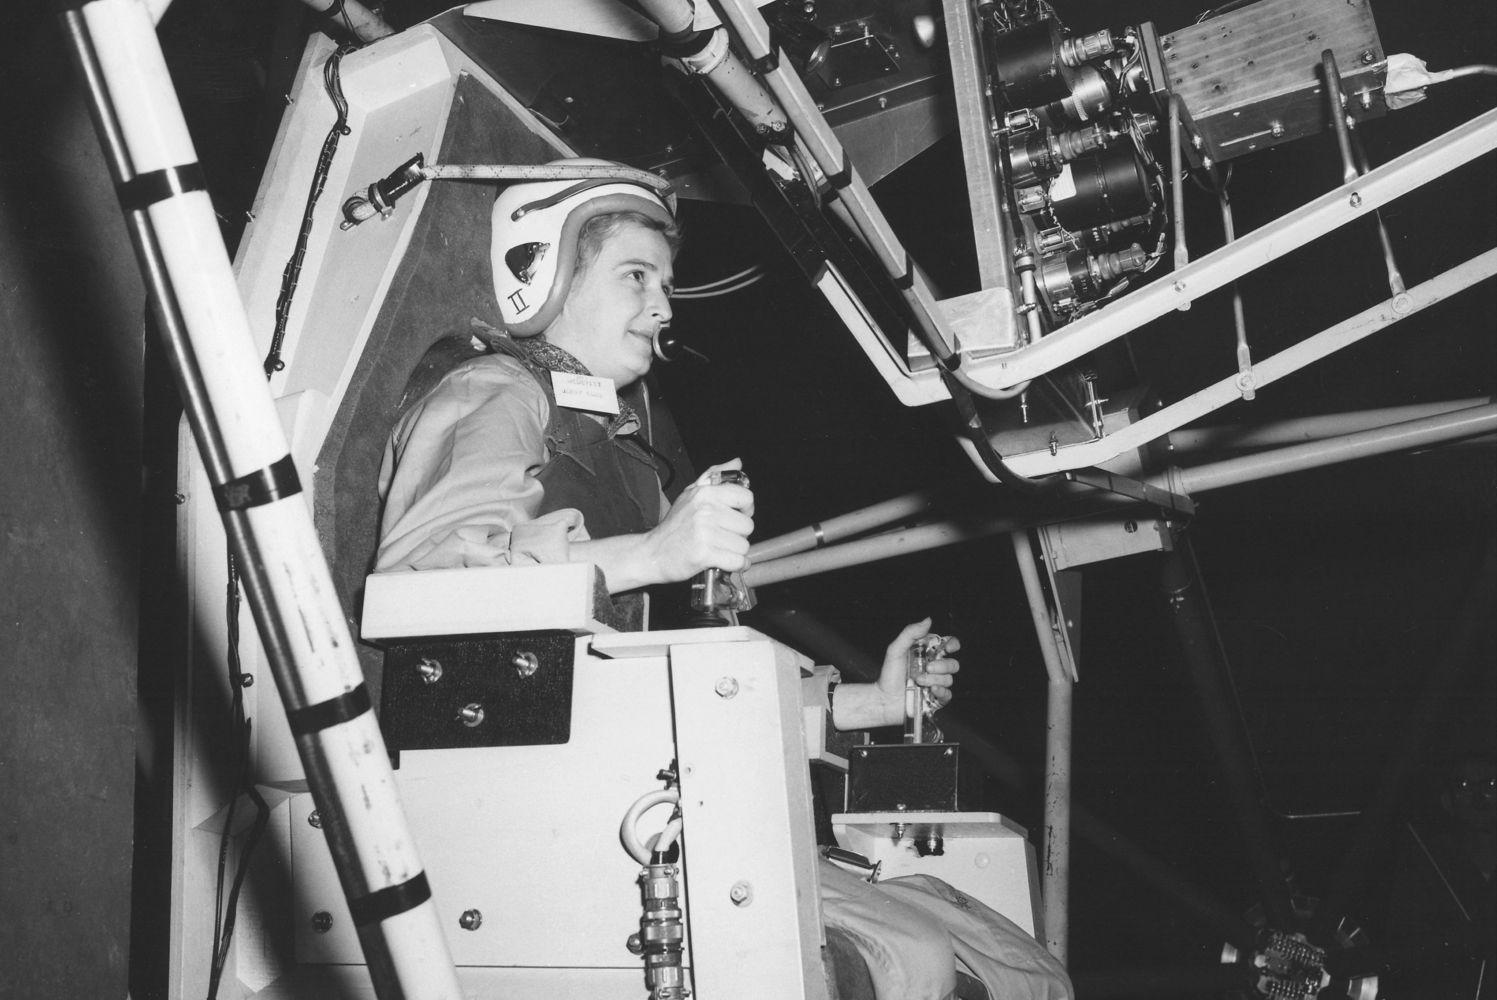 Jerrie Cobb podczas ćwiczeń w 1961 roku (fot. flickr.com/photos/nasacommons)